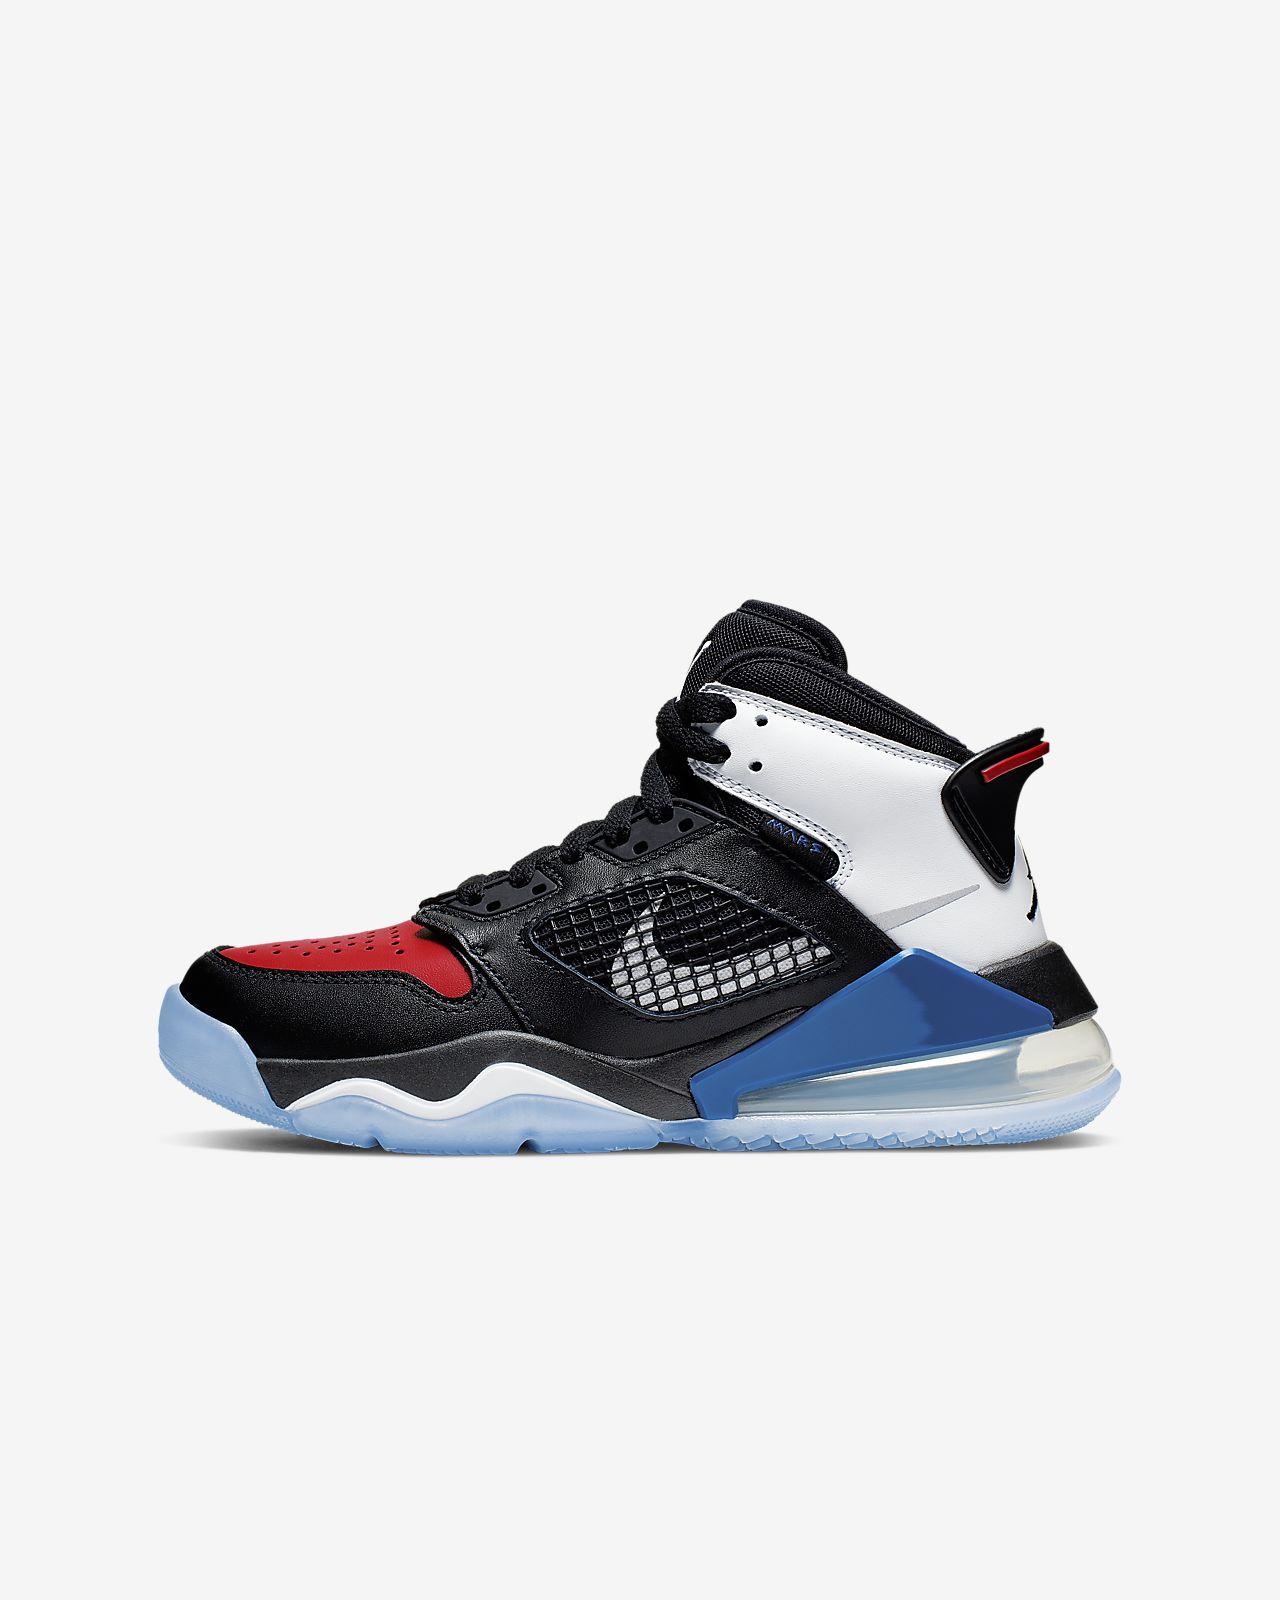 Jordan Mars 270 Schuh für ältere Kinder